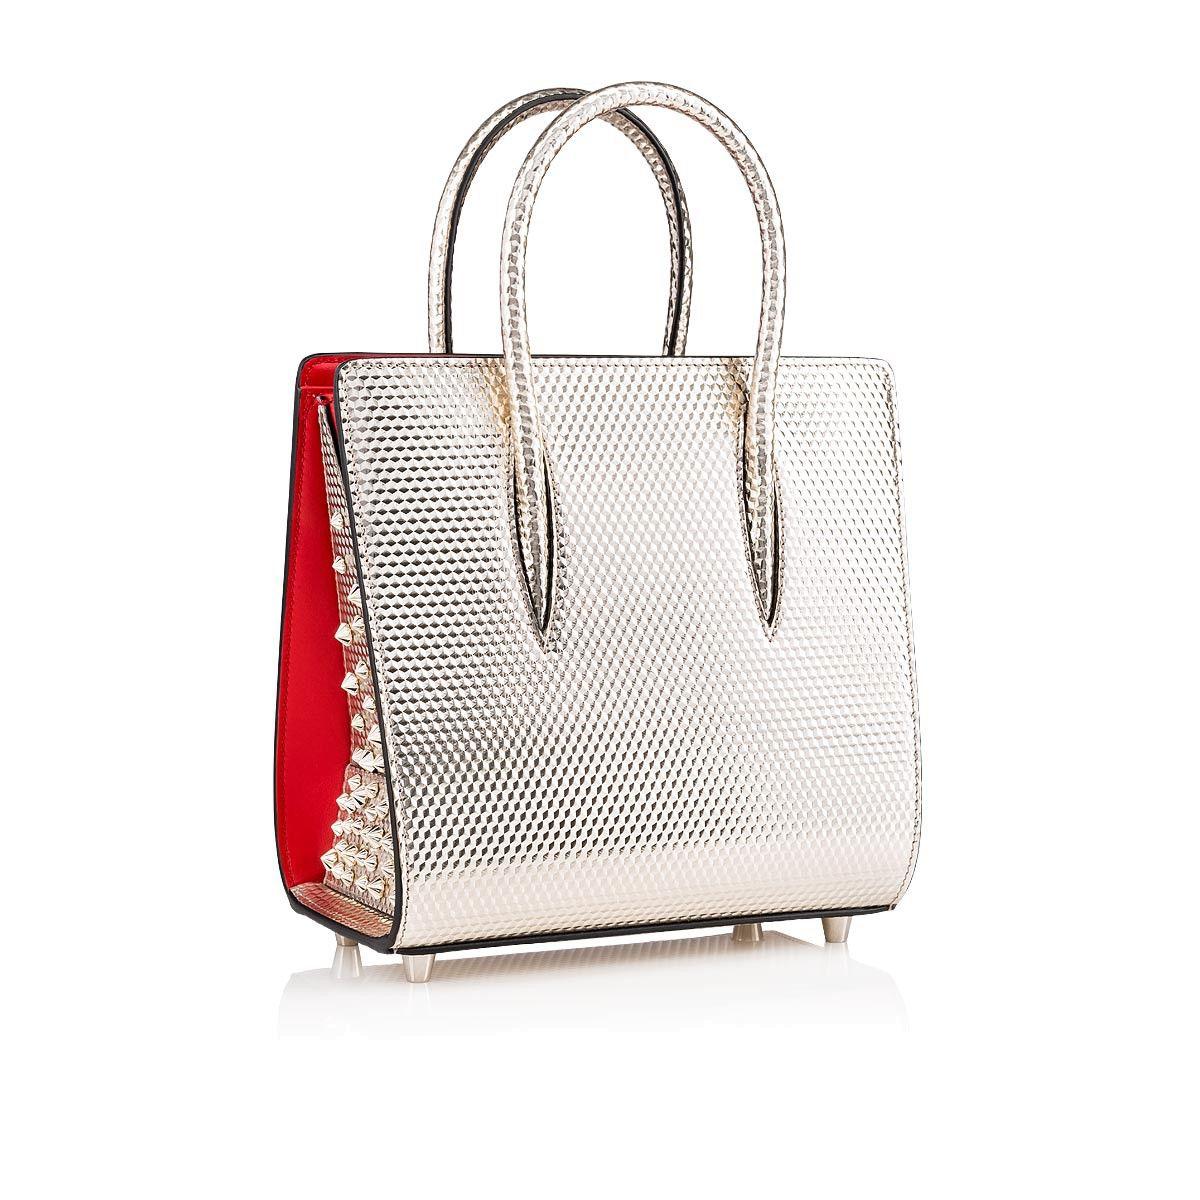 f7c12cabf81 Paloma Small Platine Calf Cubiste - Handbags - Christian Louboutin ...